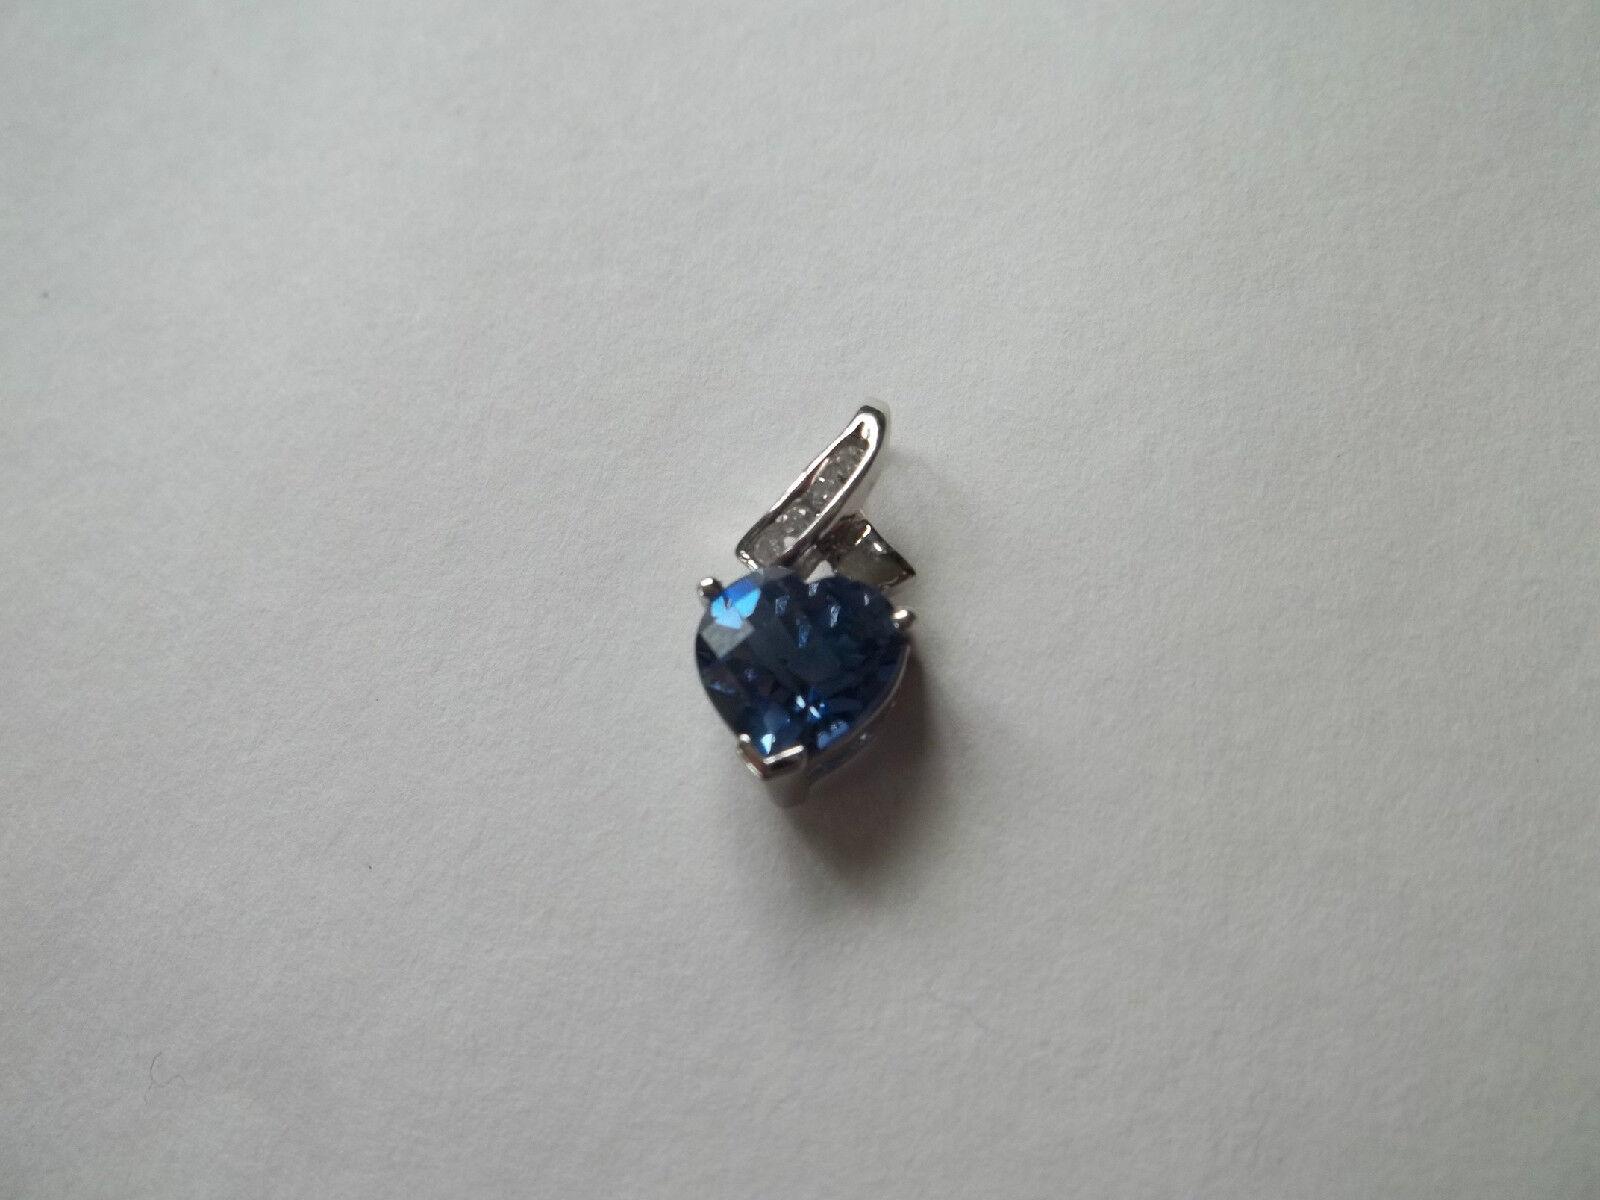 ALWAND VAHAN 10K white gold pendant,diamonds,purple bluee heart stone,great cnd,